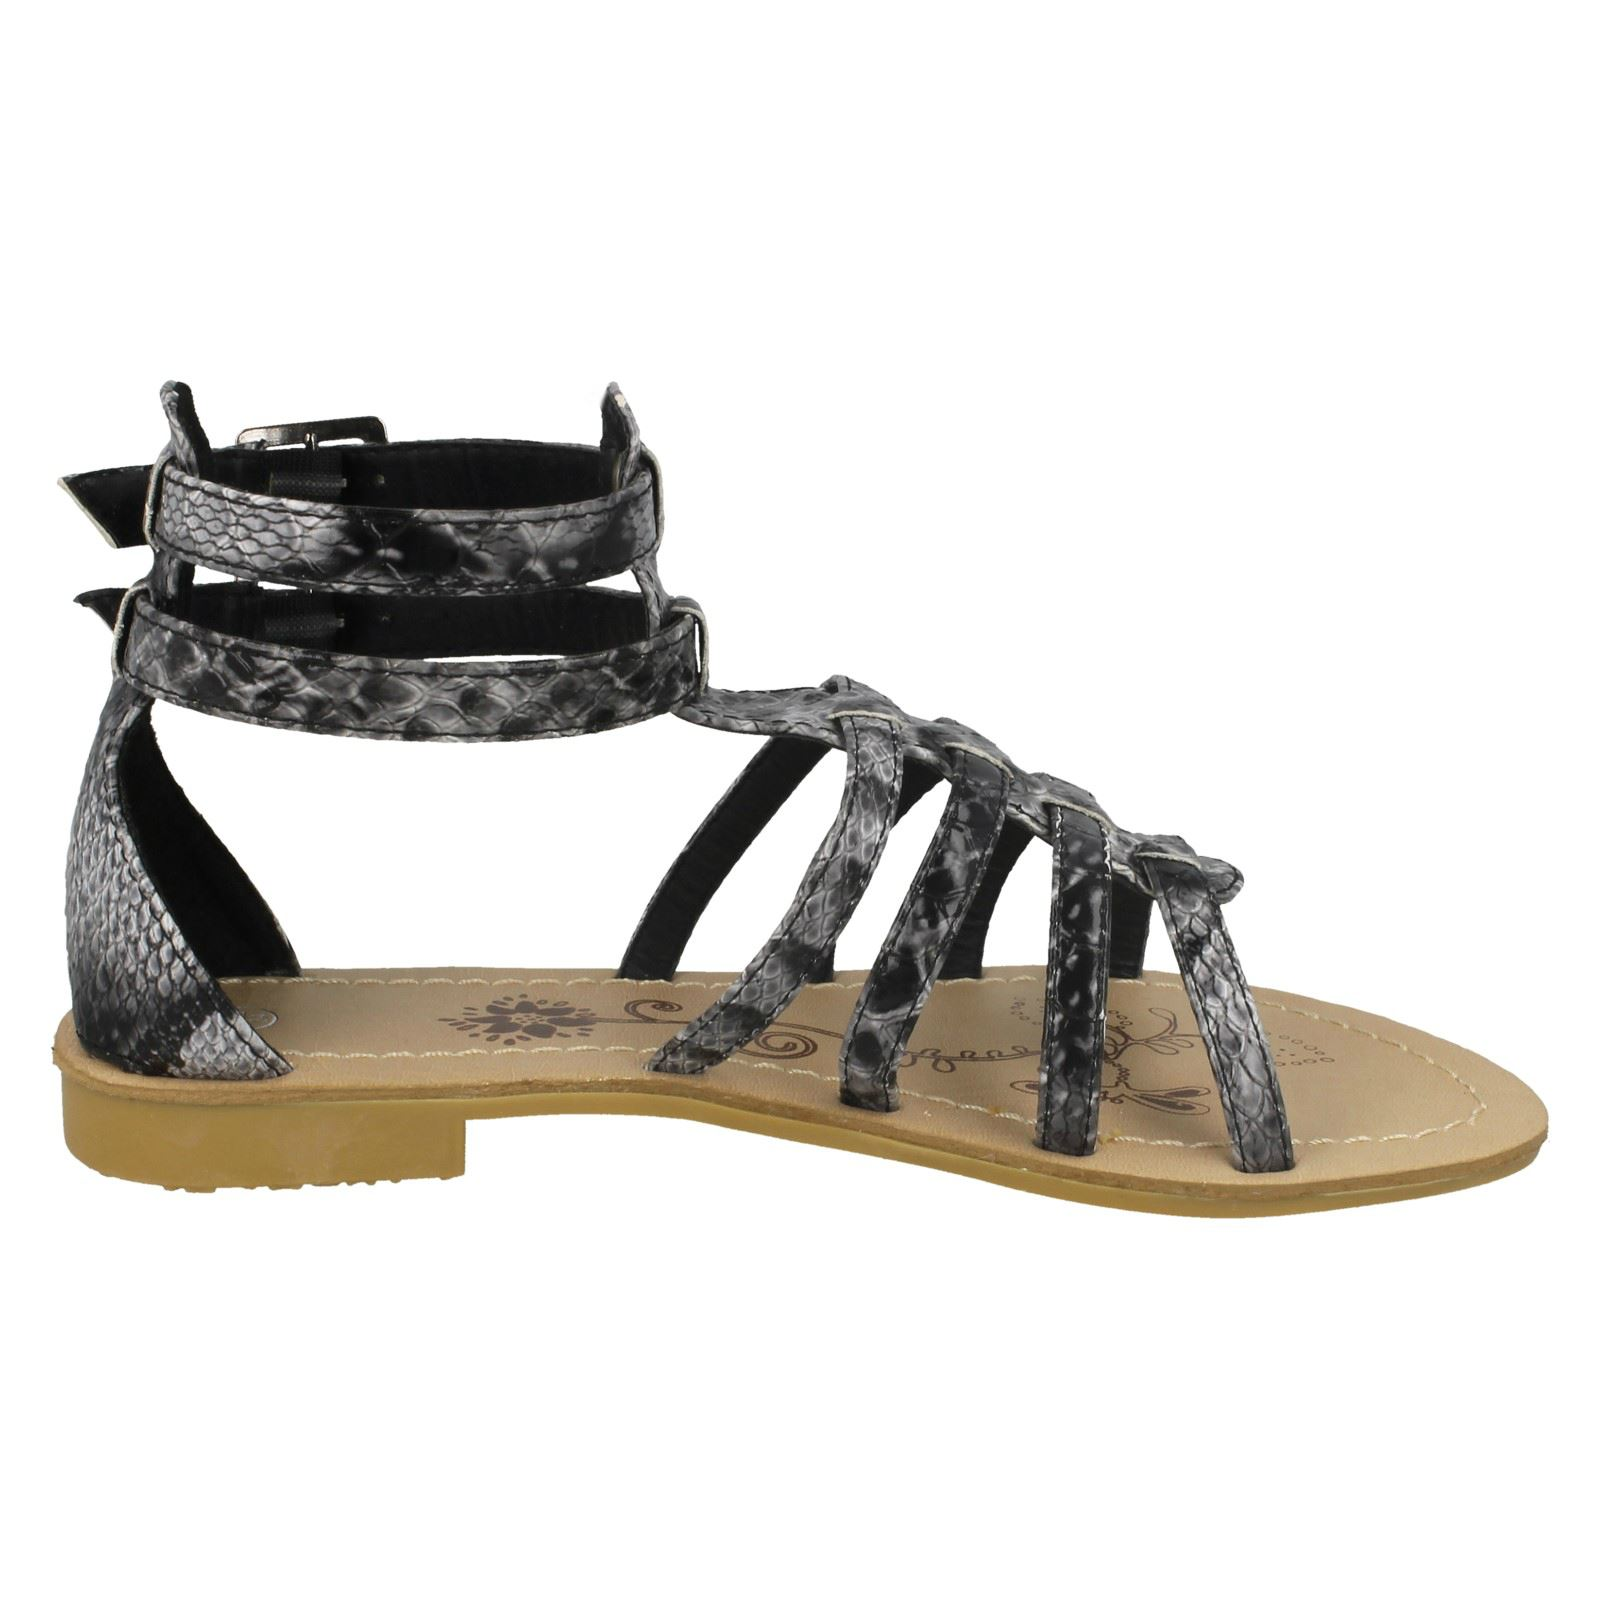 Niñas Punto en doble hebilla Sandalias Gladiador 'H0047'